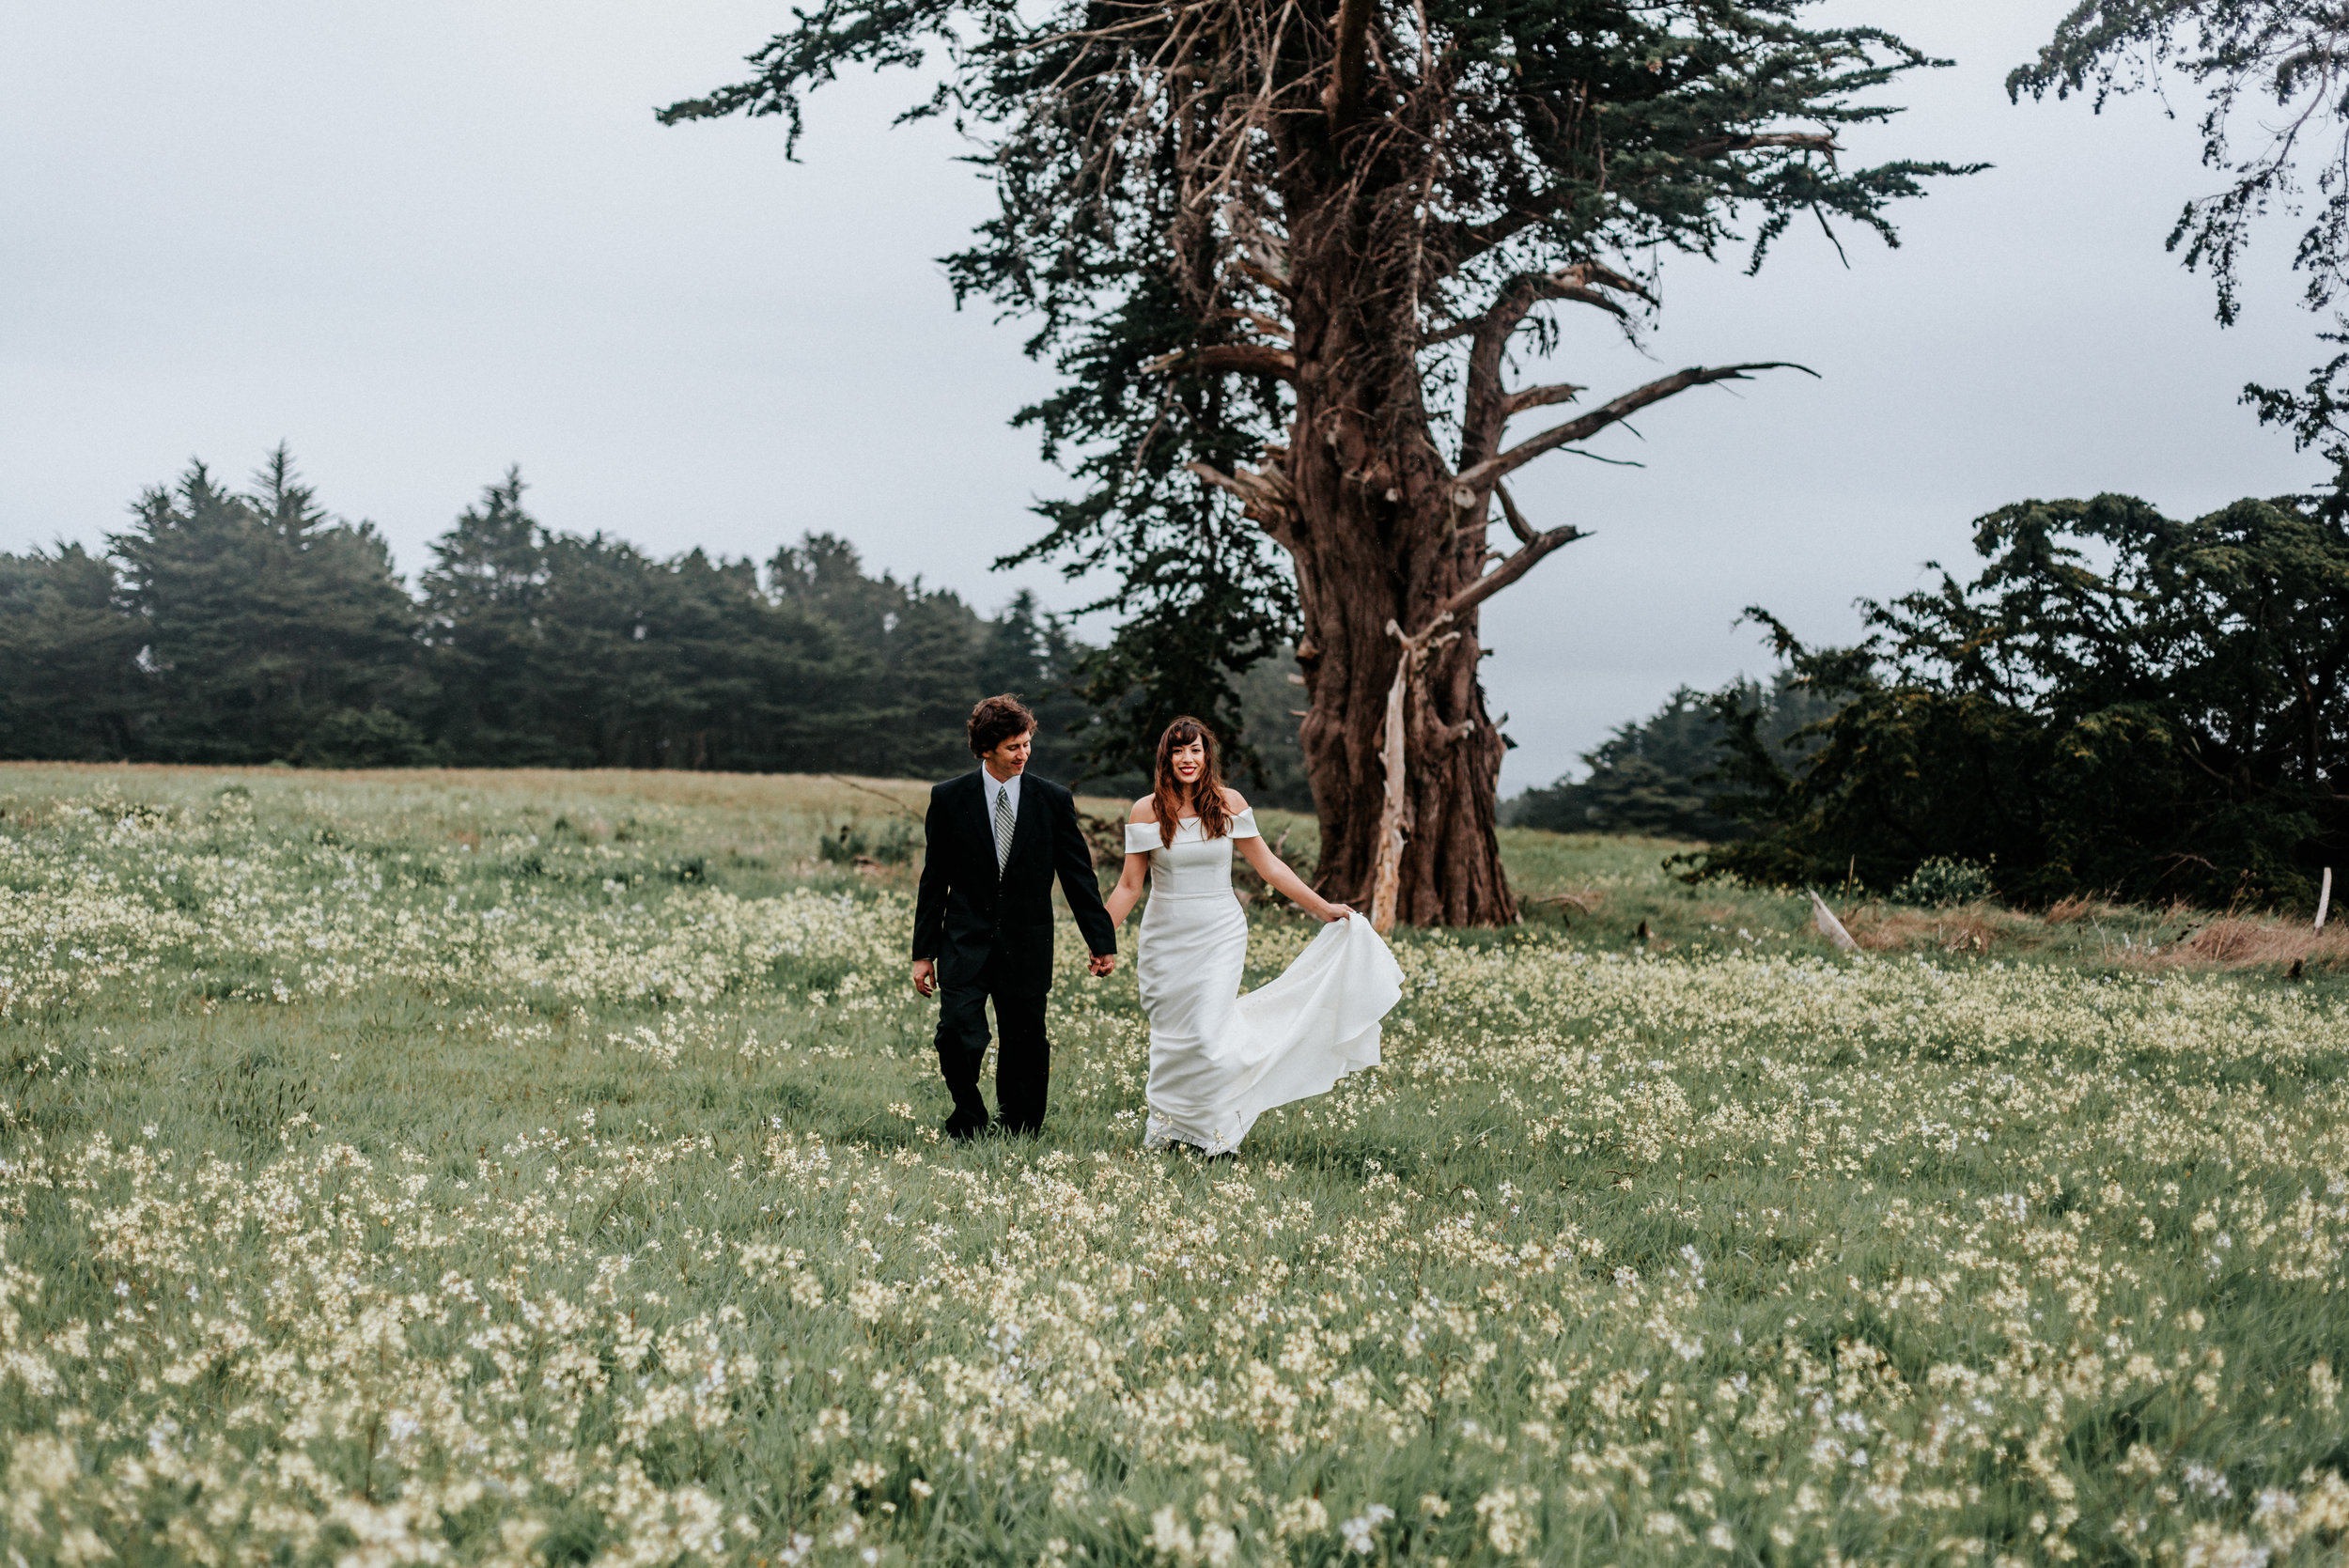 Albion River Inn Wedding in Albion Caliornia-22.jpg